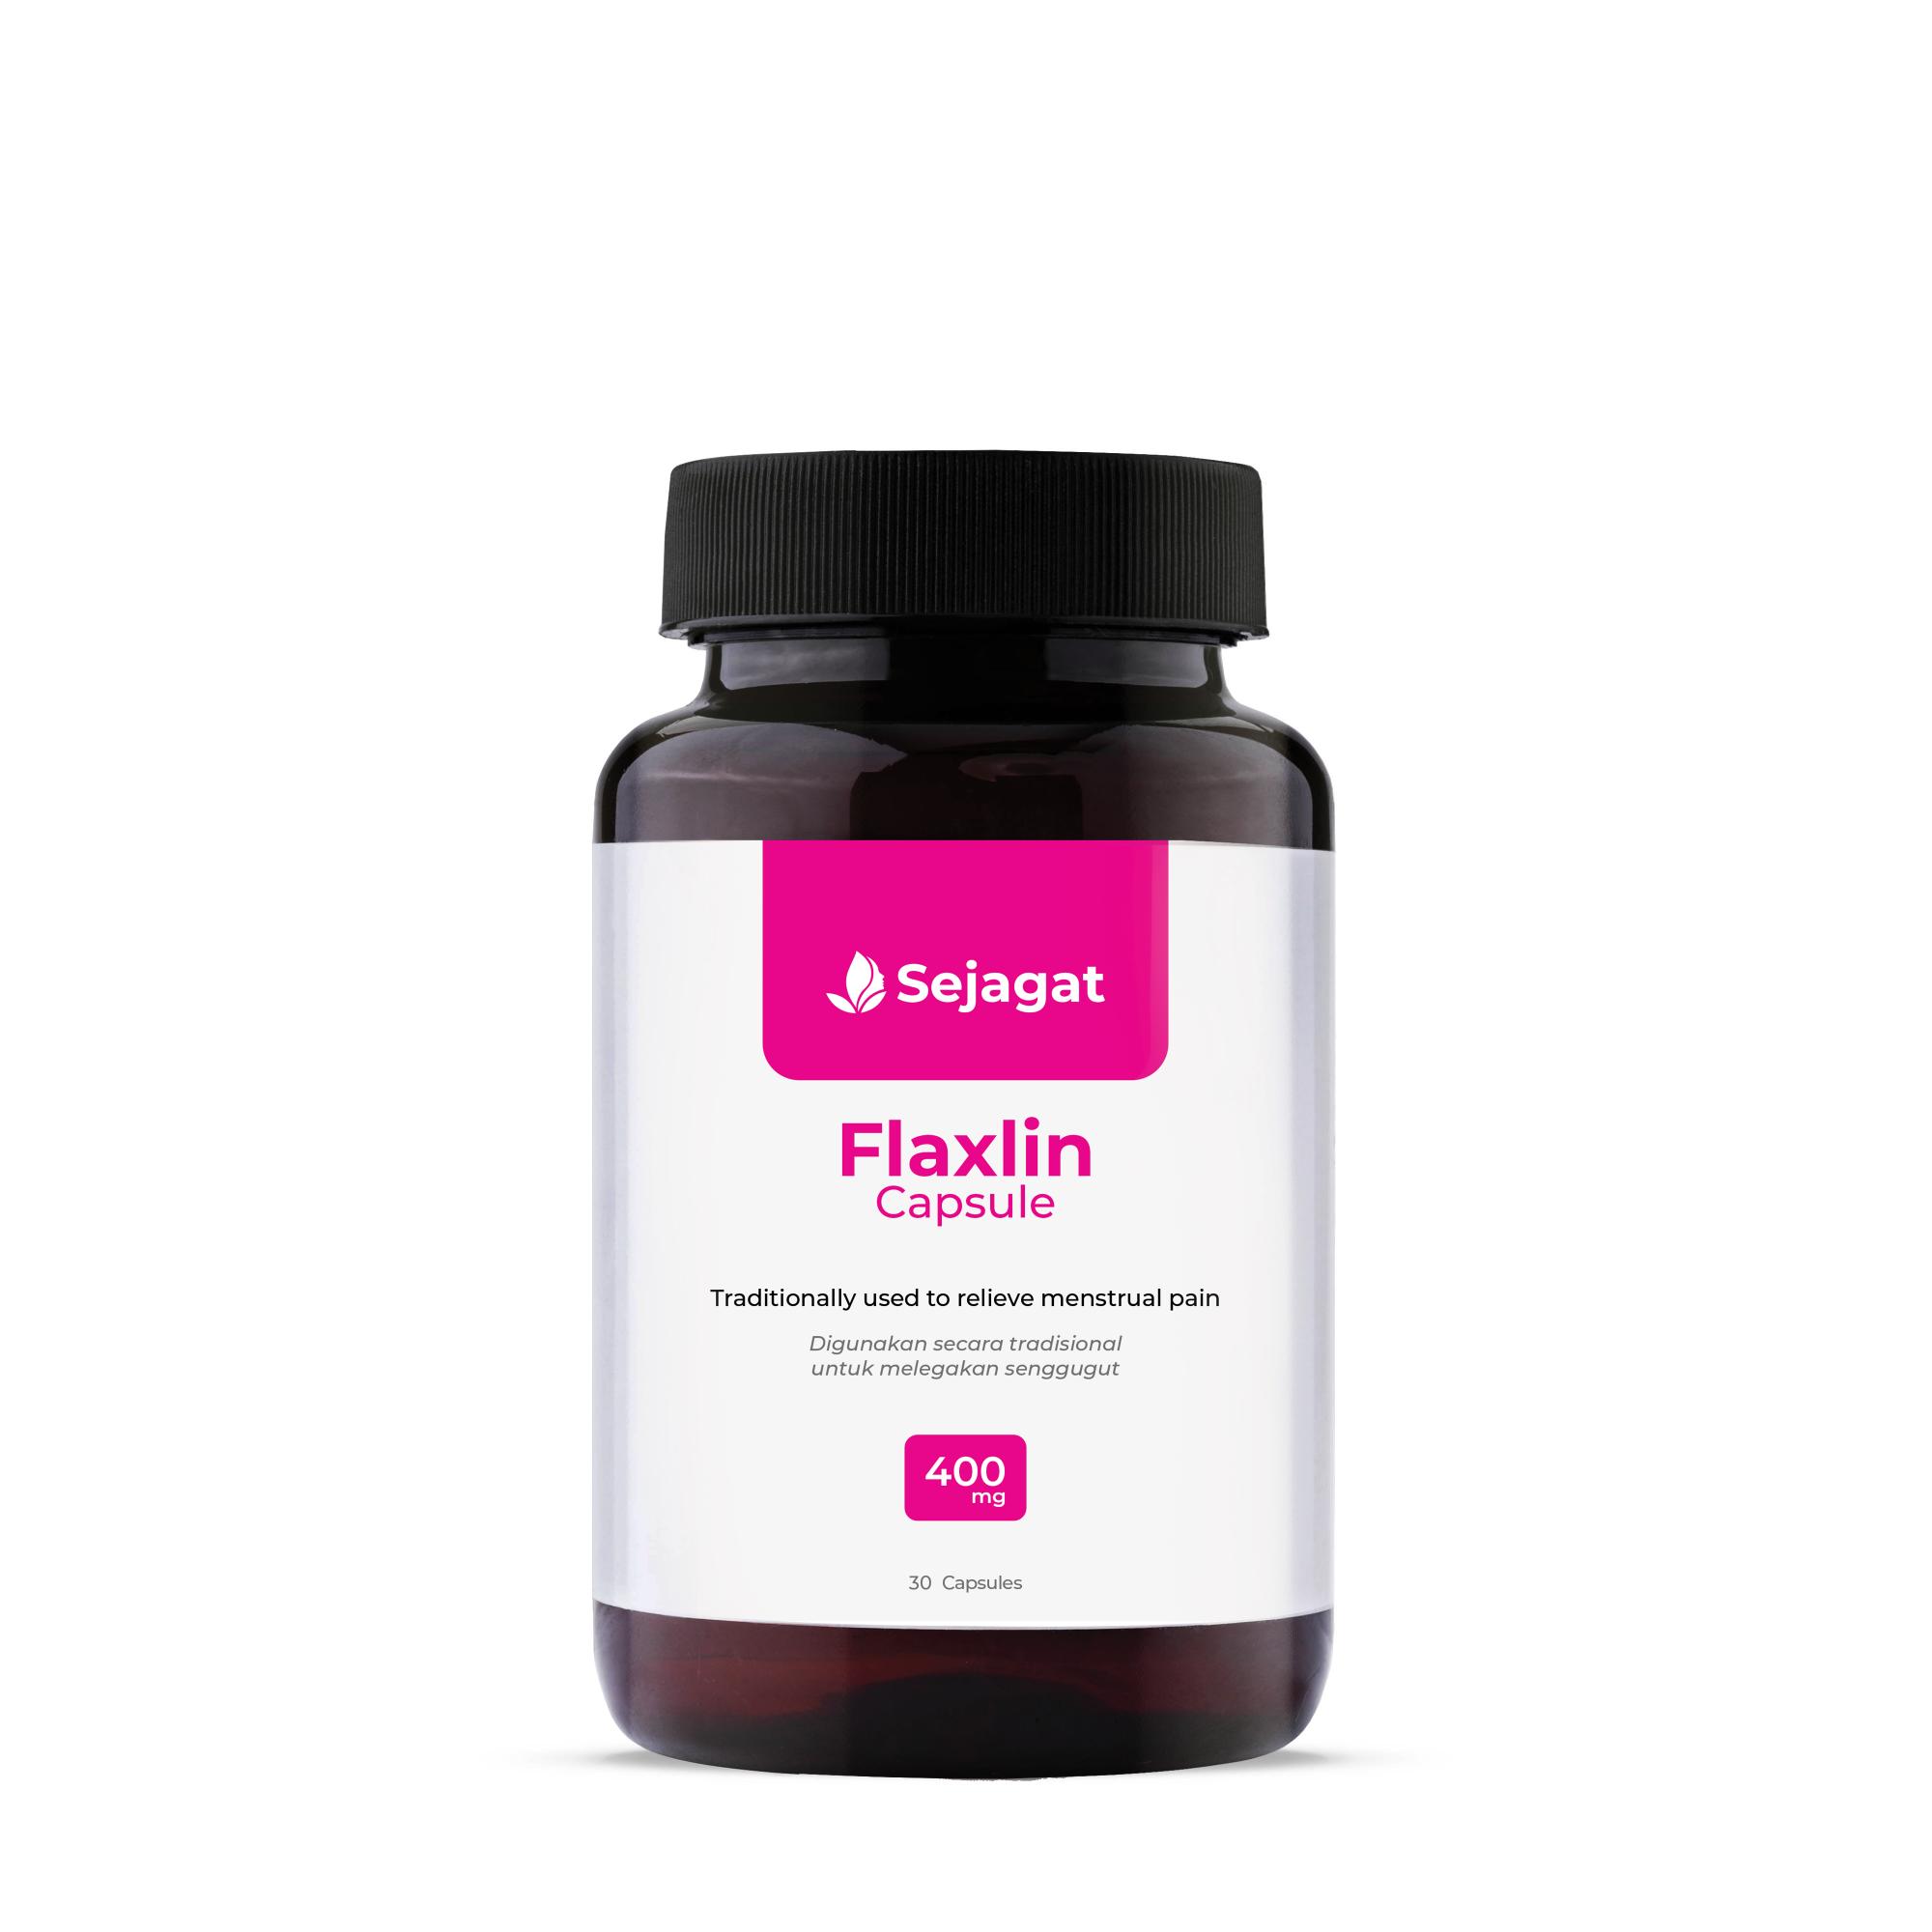 Flaxlin Capsule